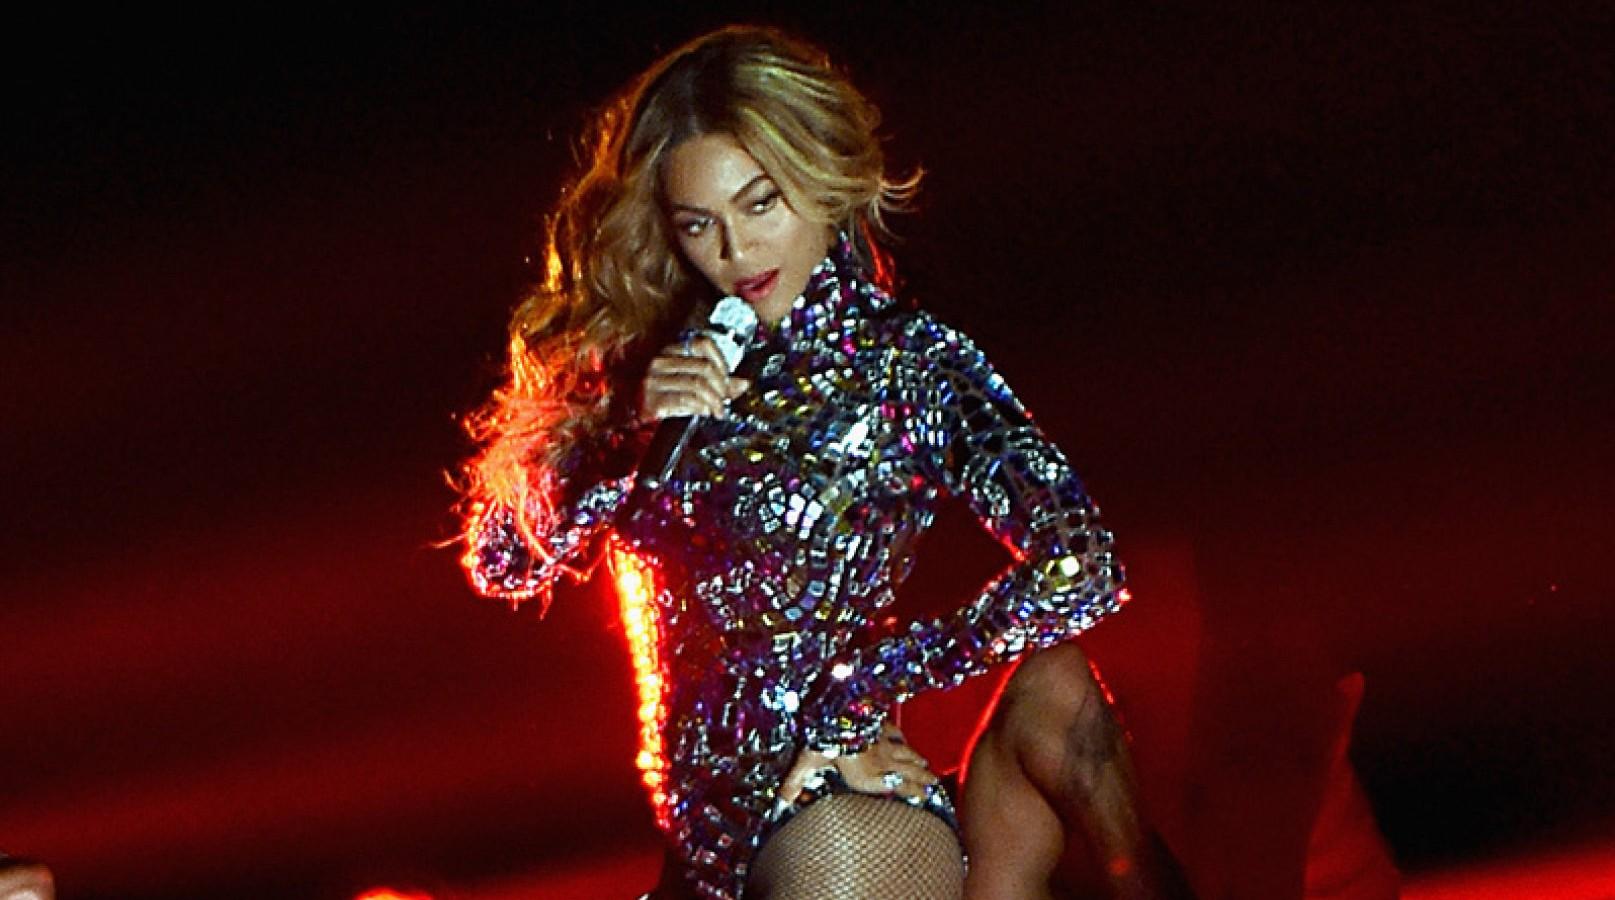 Beyonce Vma 2014 Beyonce-vma-2014-2-ilikeitalot